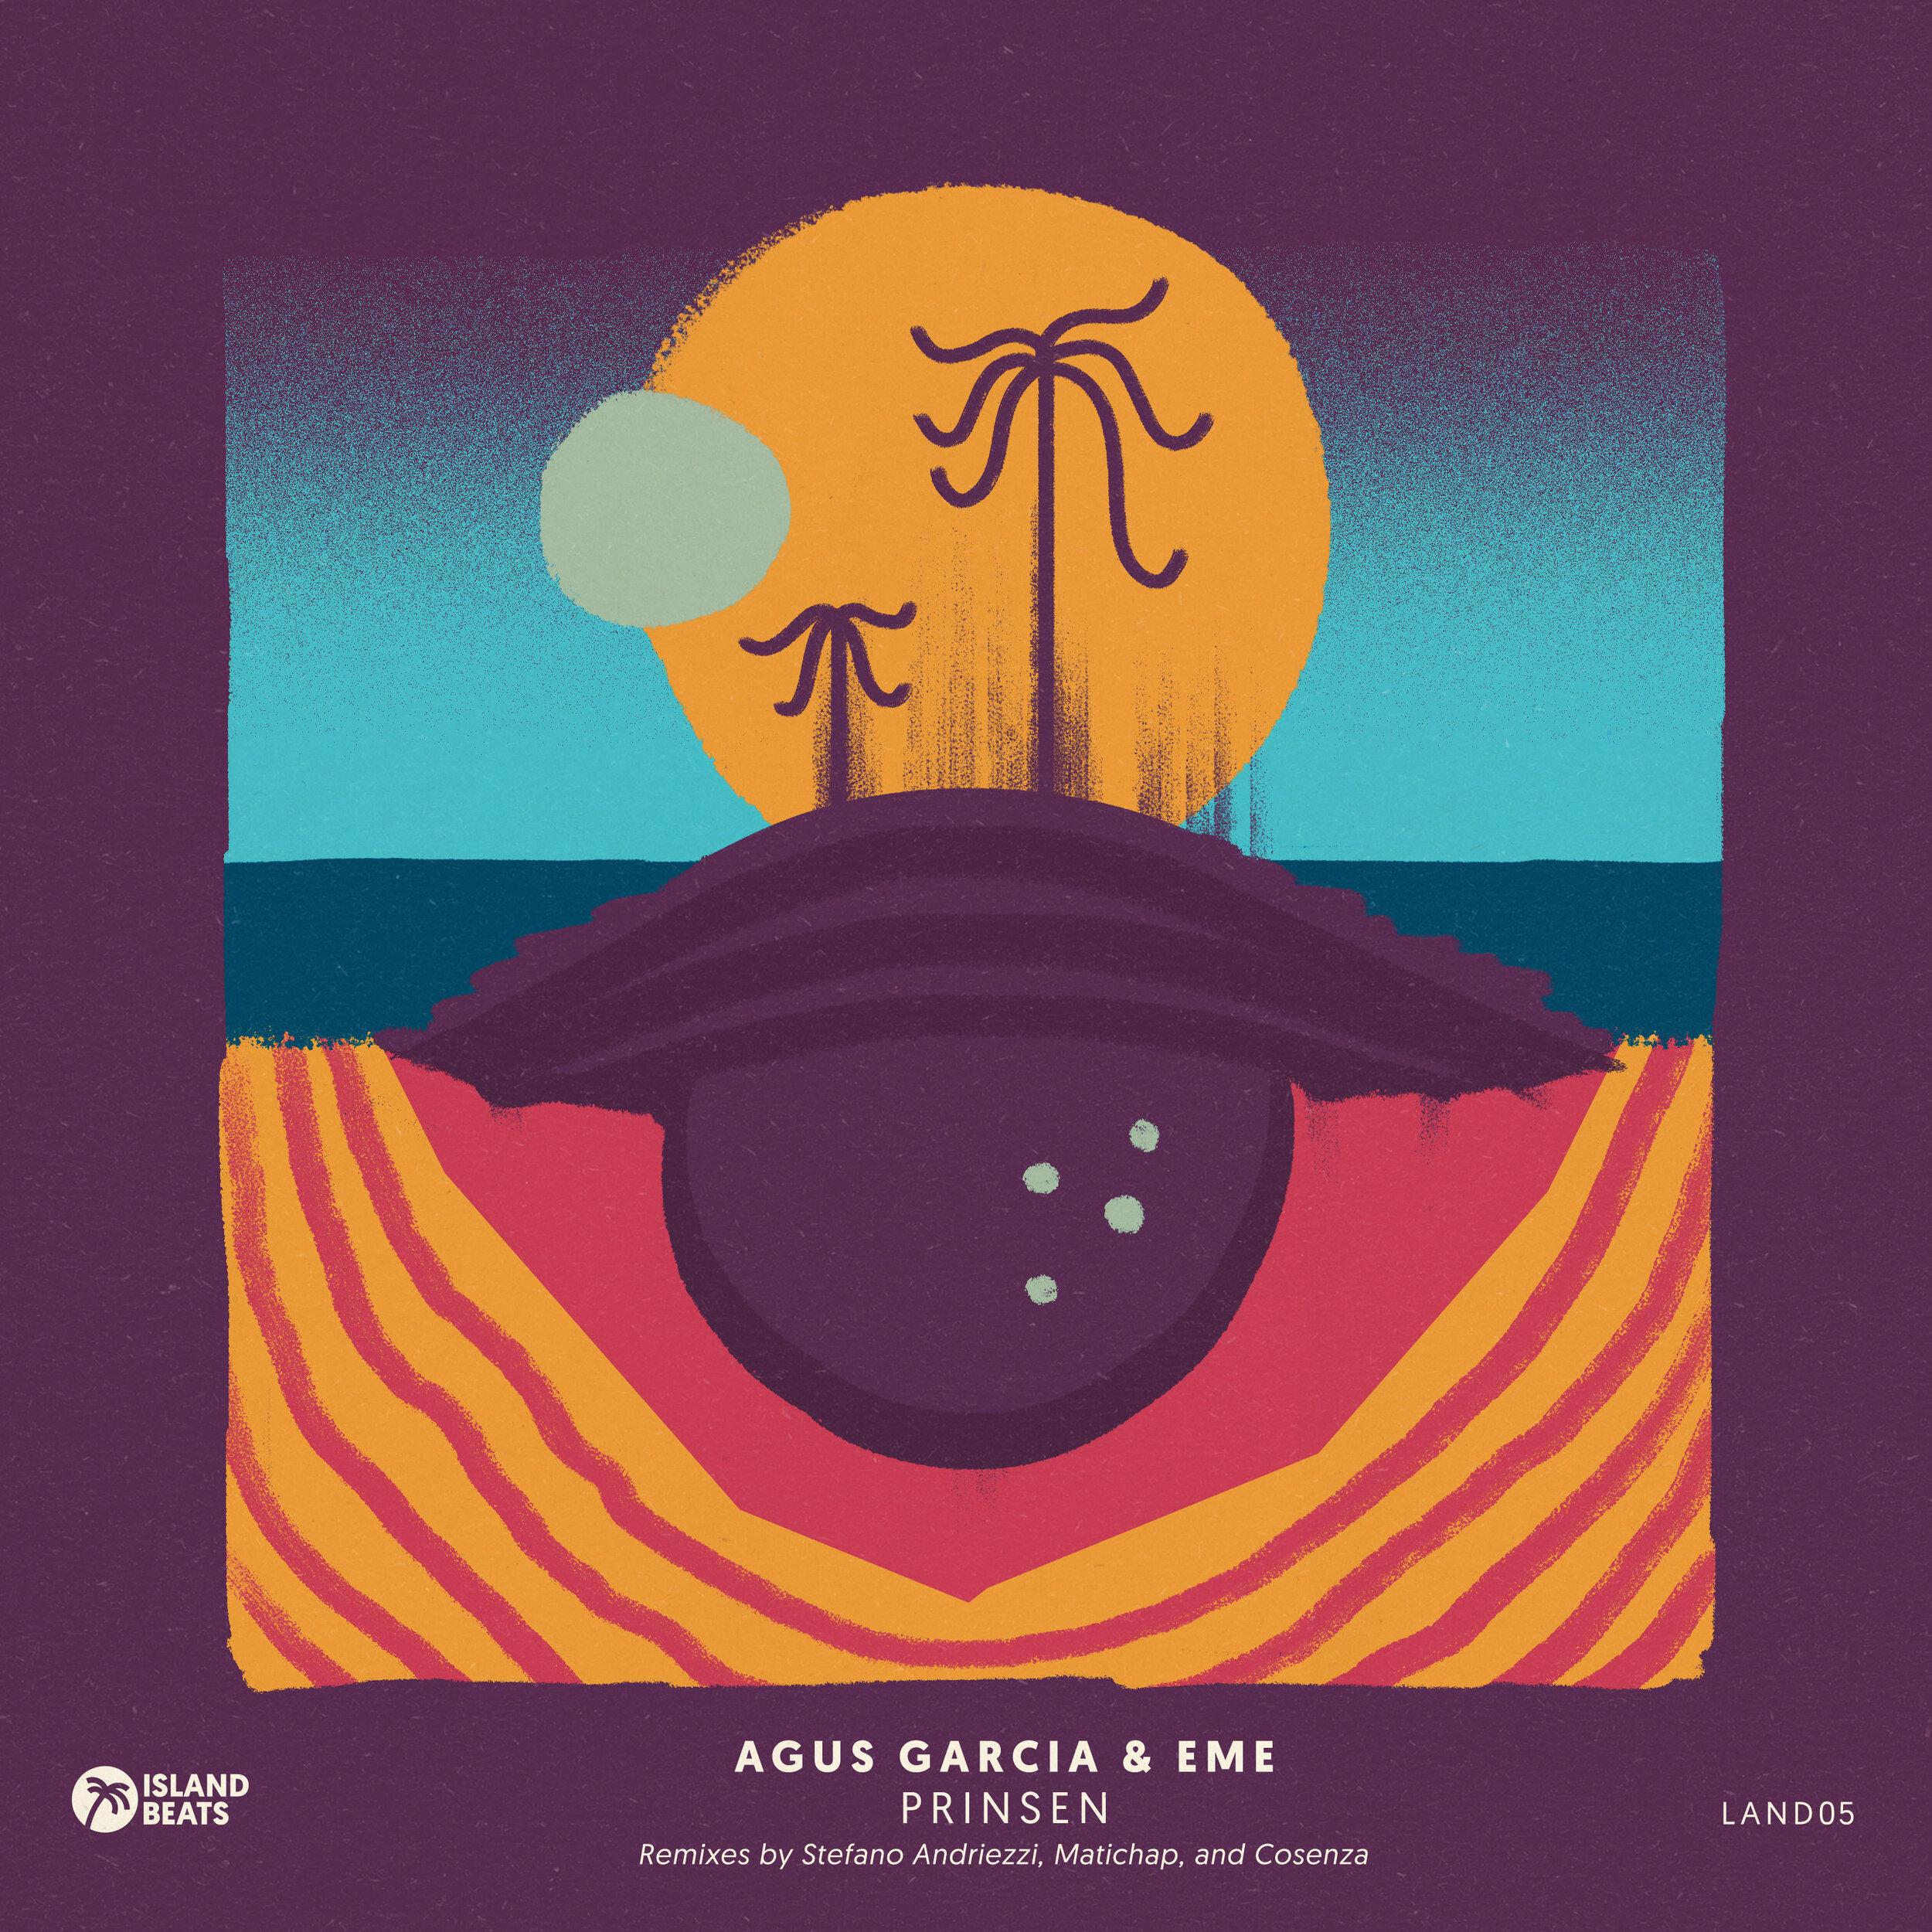 Agus Garcia & eme - Prisen - Remixes by Stefano Andriezzi, Matichap, Cosenza